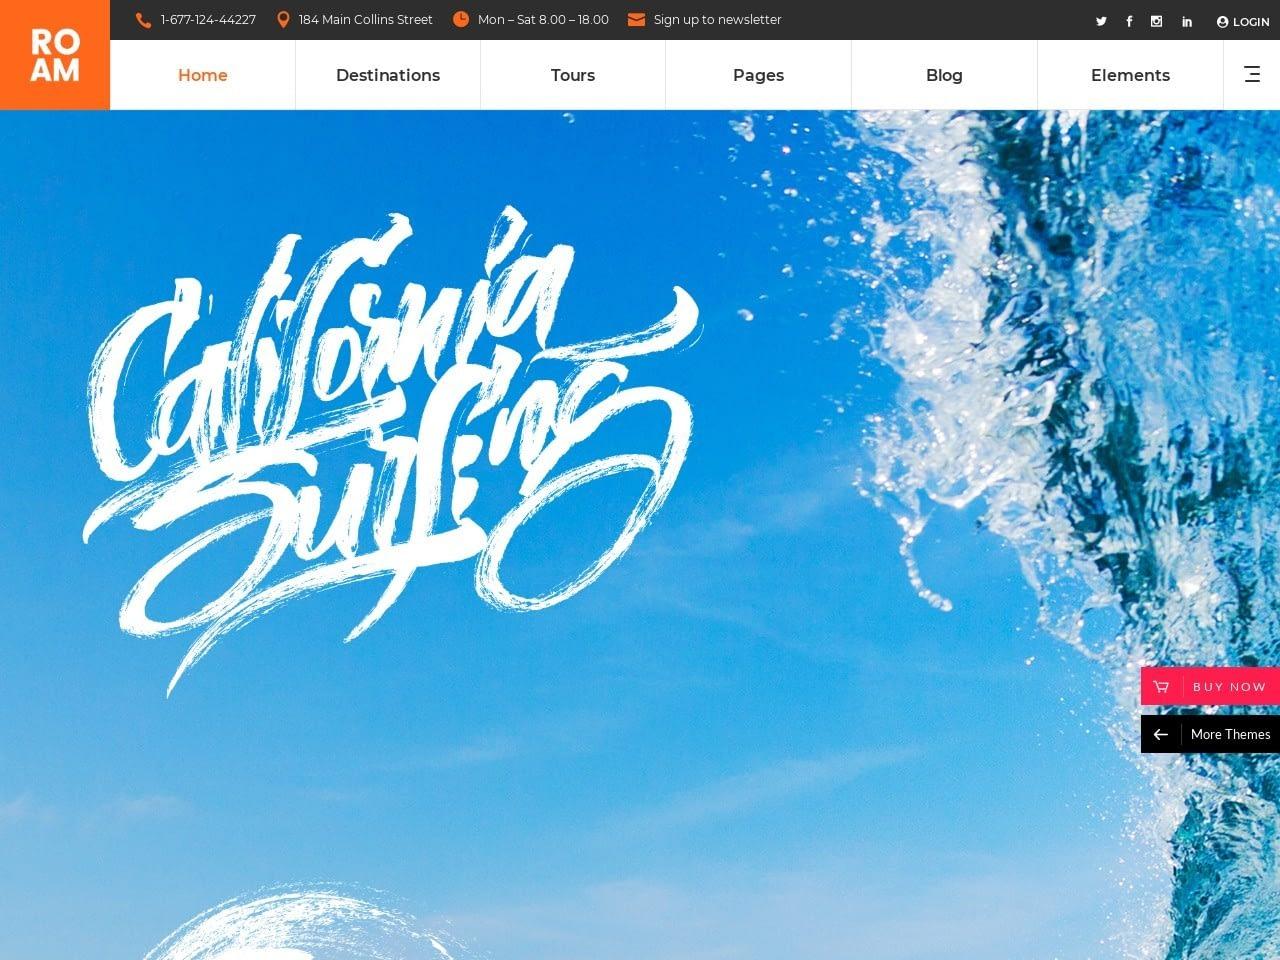 httpsroammikadothemescomsurfingshowcase - golivenow.uk